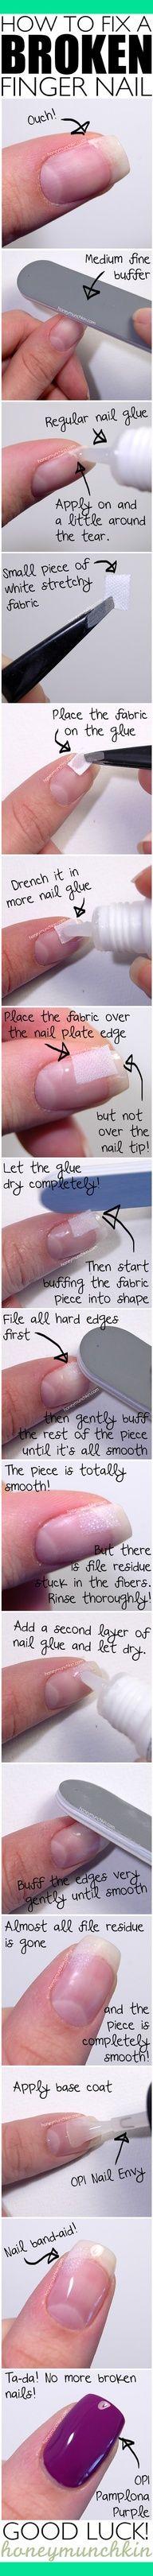 Tutorial: How to fix a broken finger nail